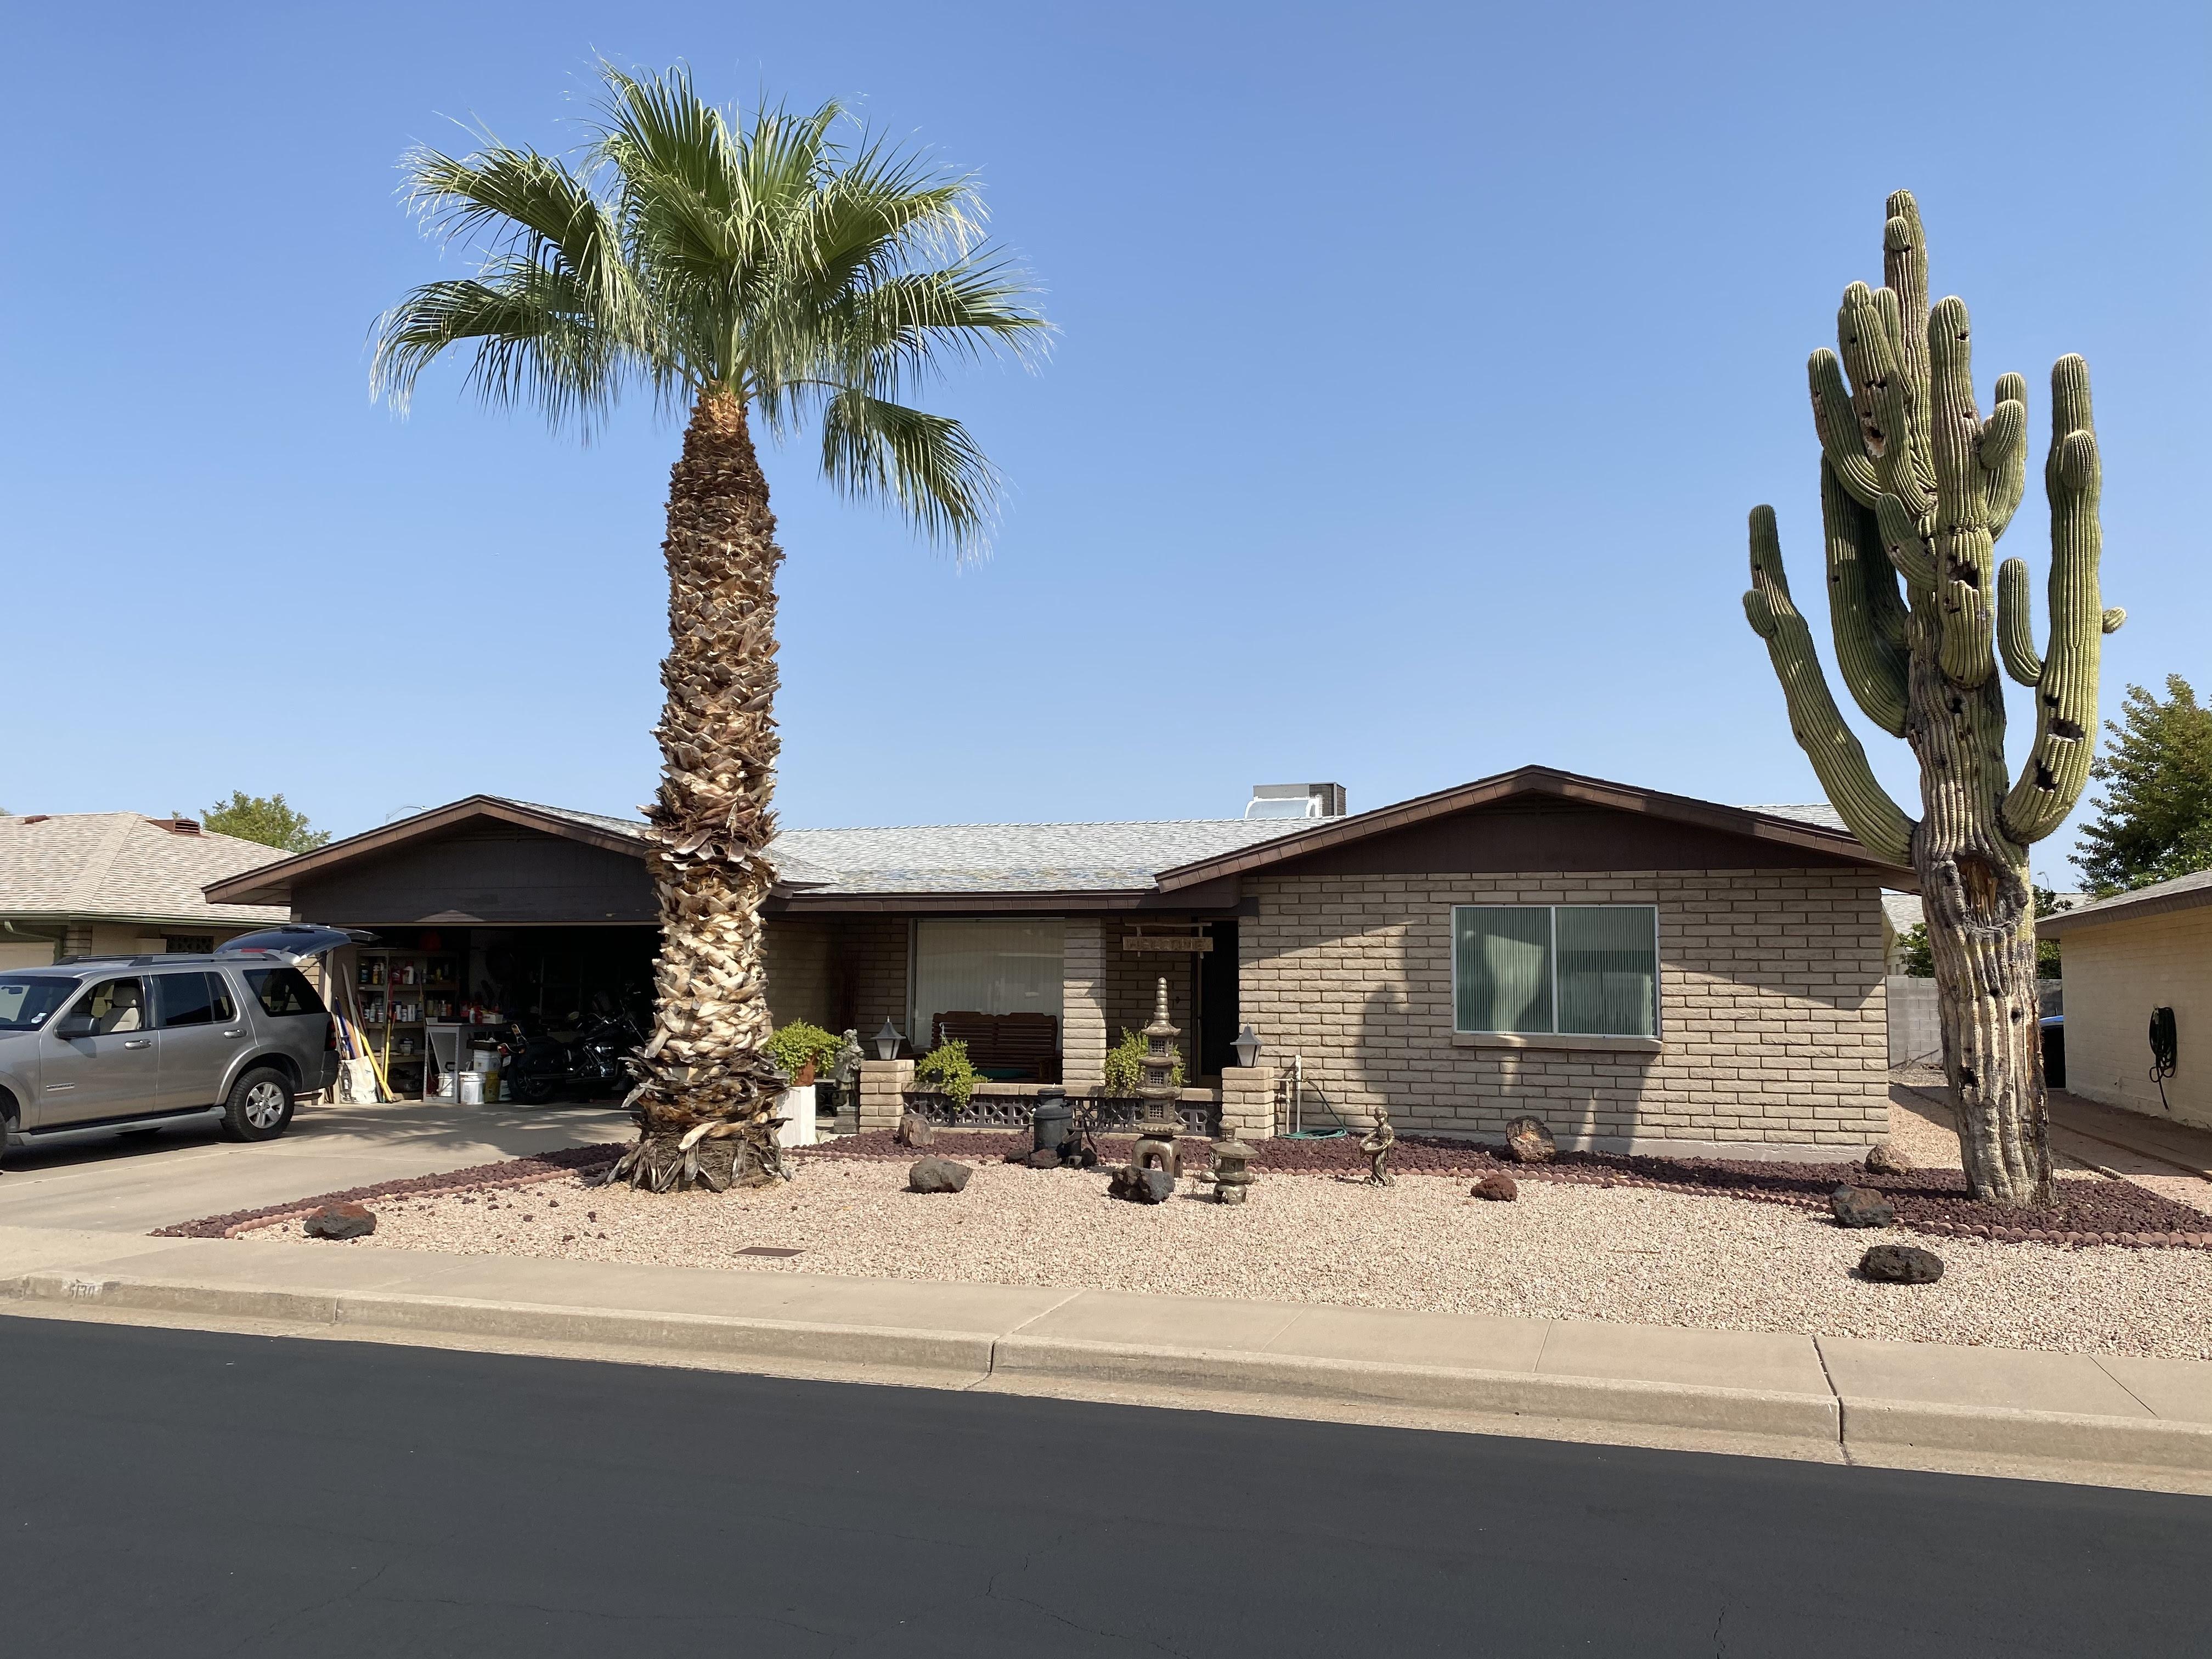 5130 E Forge Cir Mesa, AZ 85206 wholesale property listing